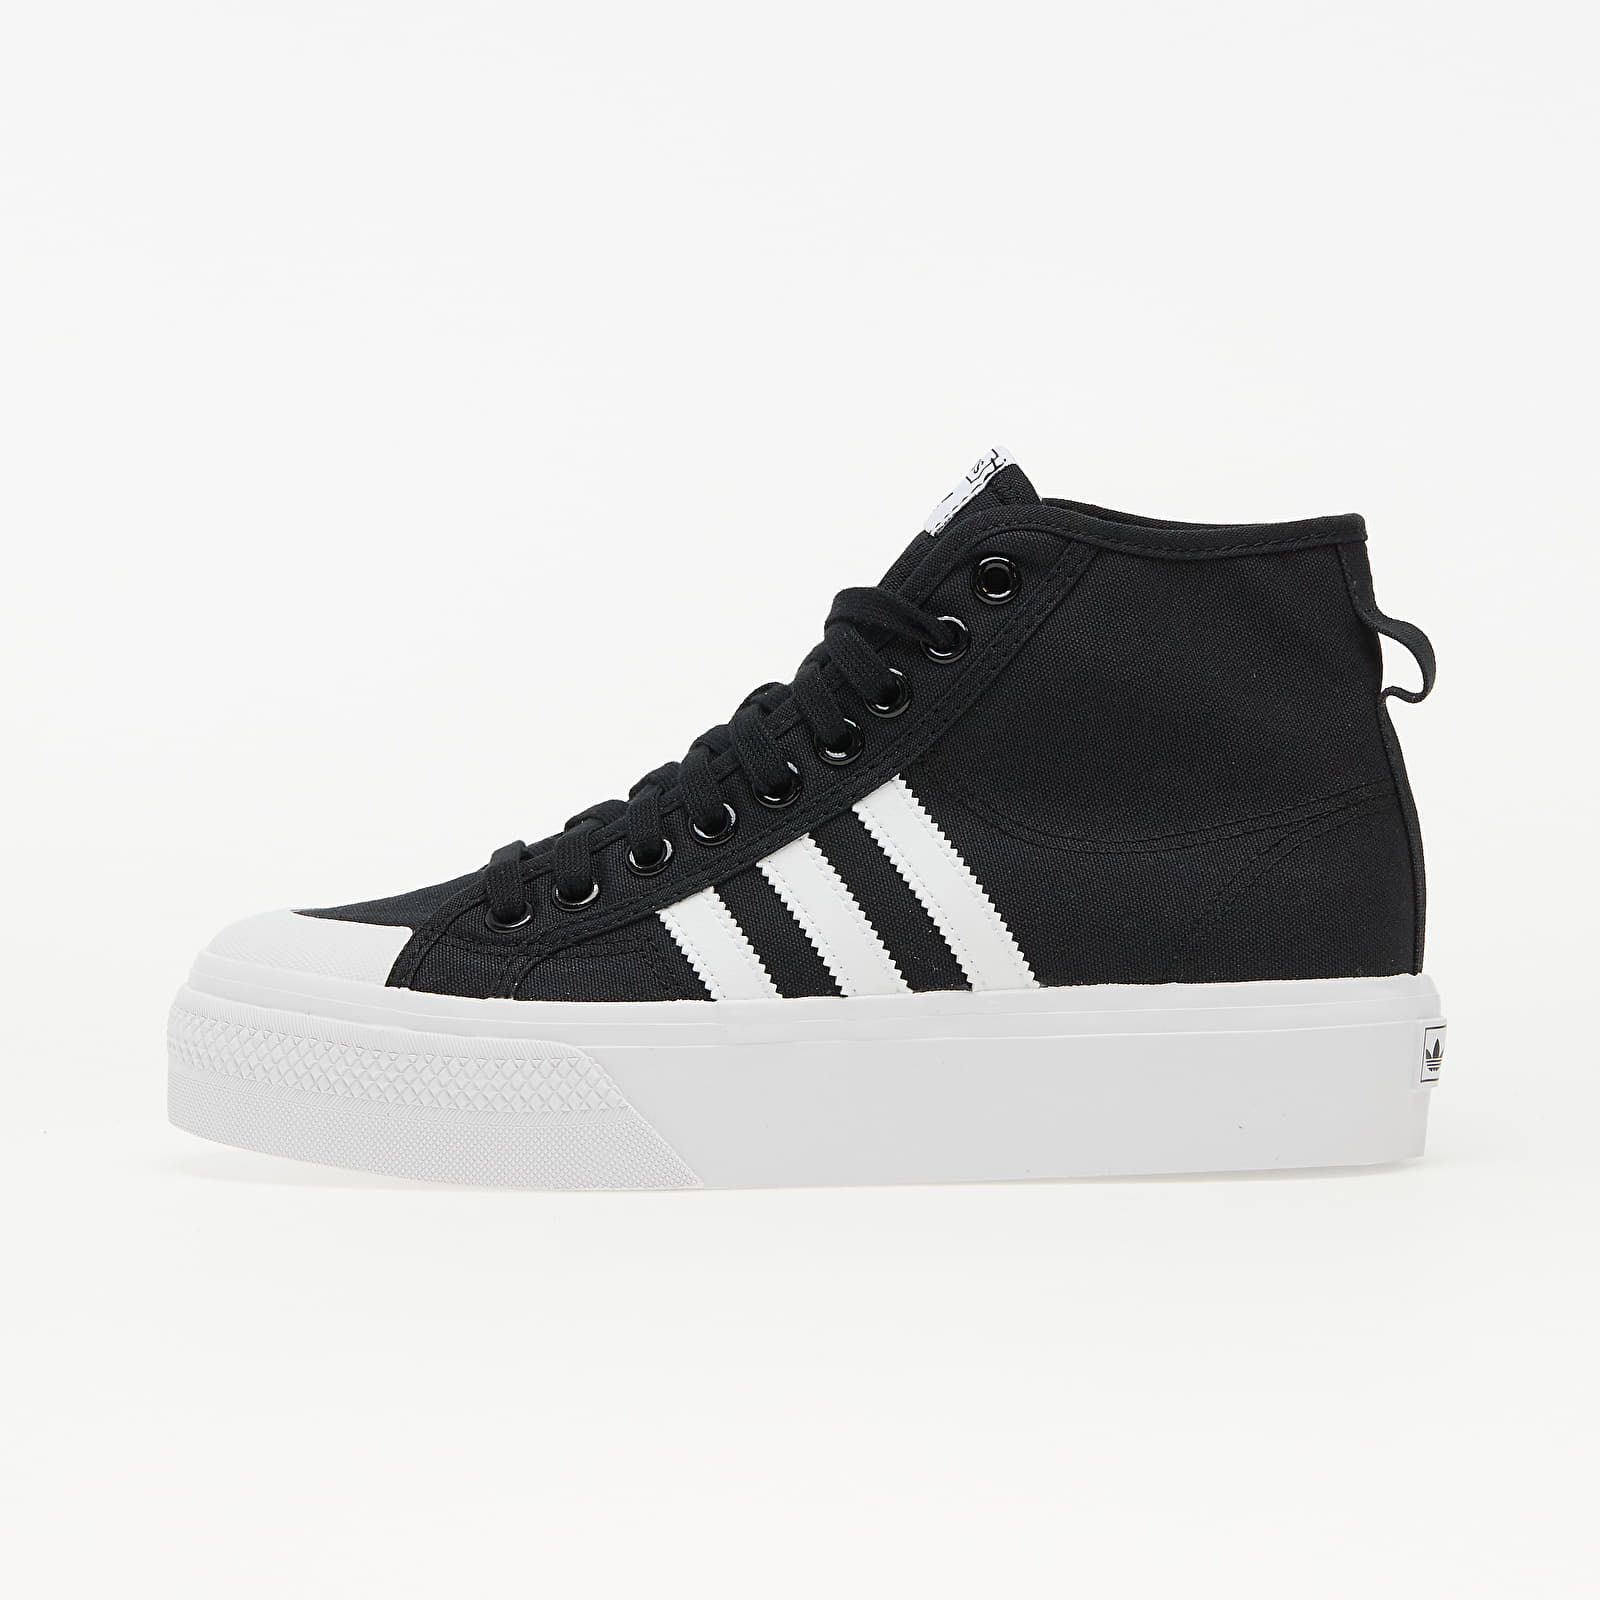 adidas Nizza Platform Mid W Core Black/ Ftw White/ Ftw White EUR 36